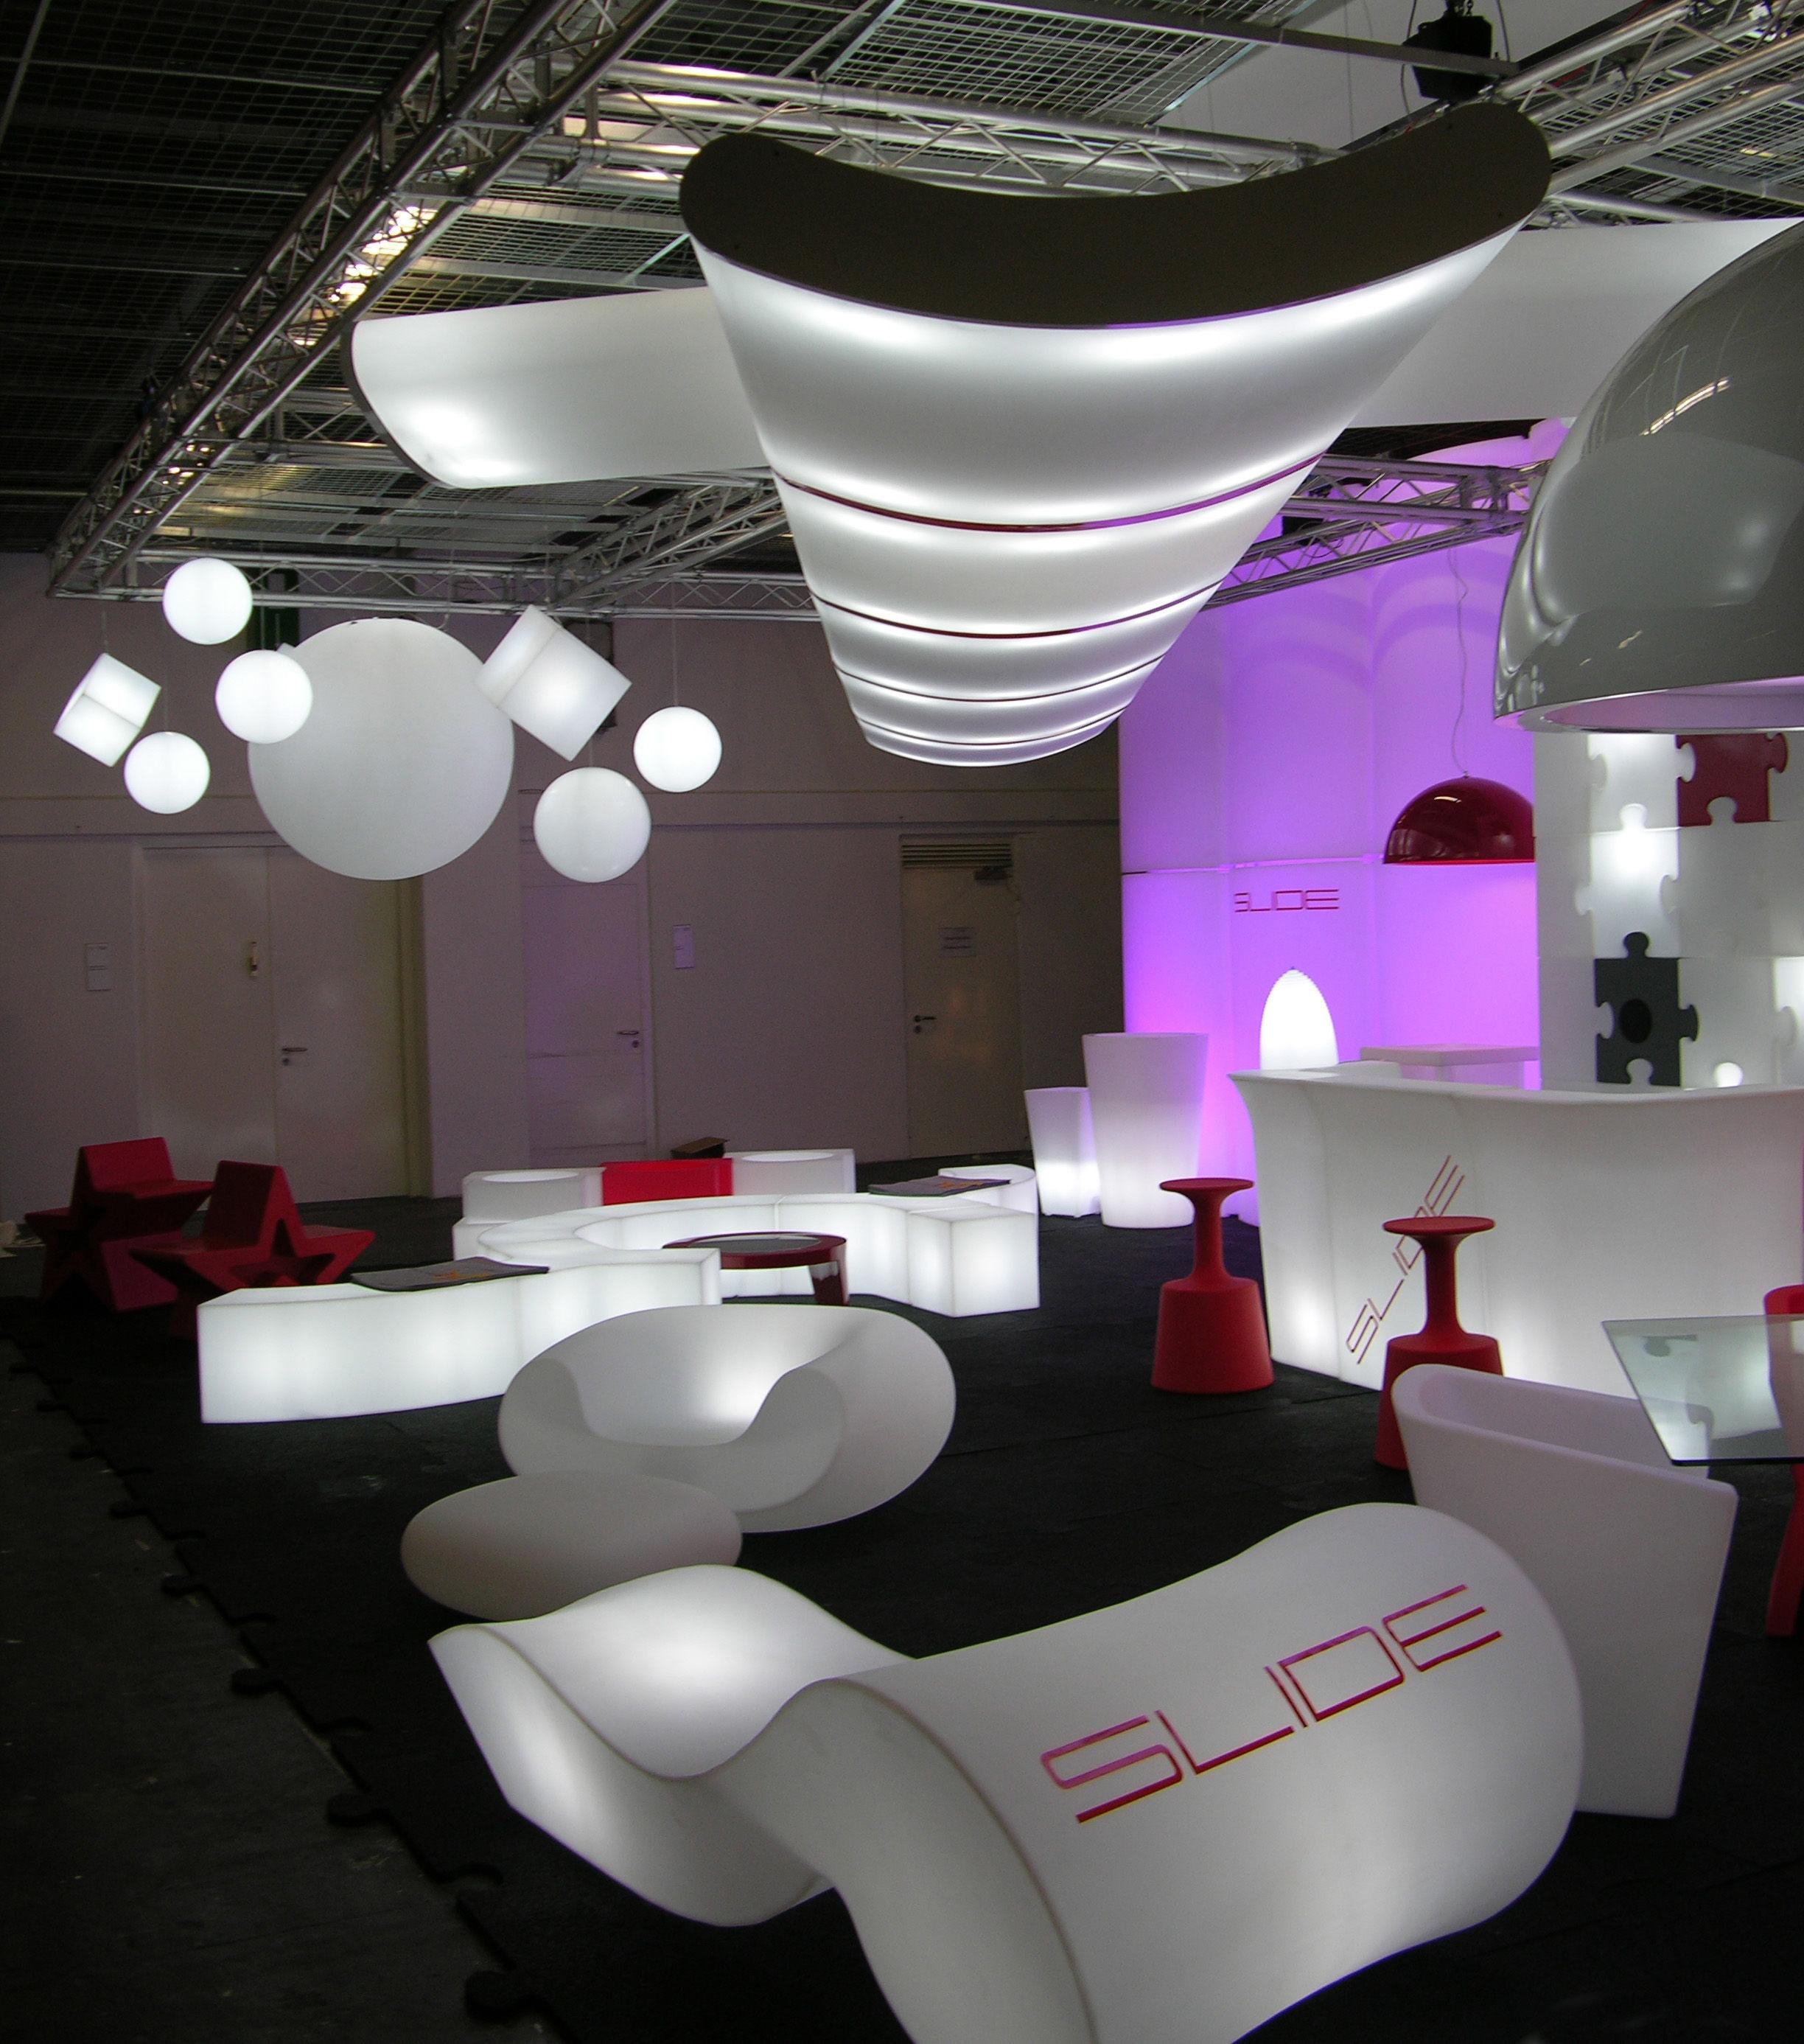 Snack Luminous bar - Luminous White by Slide | Made In Design UK